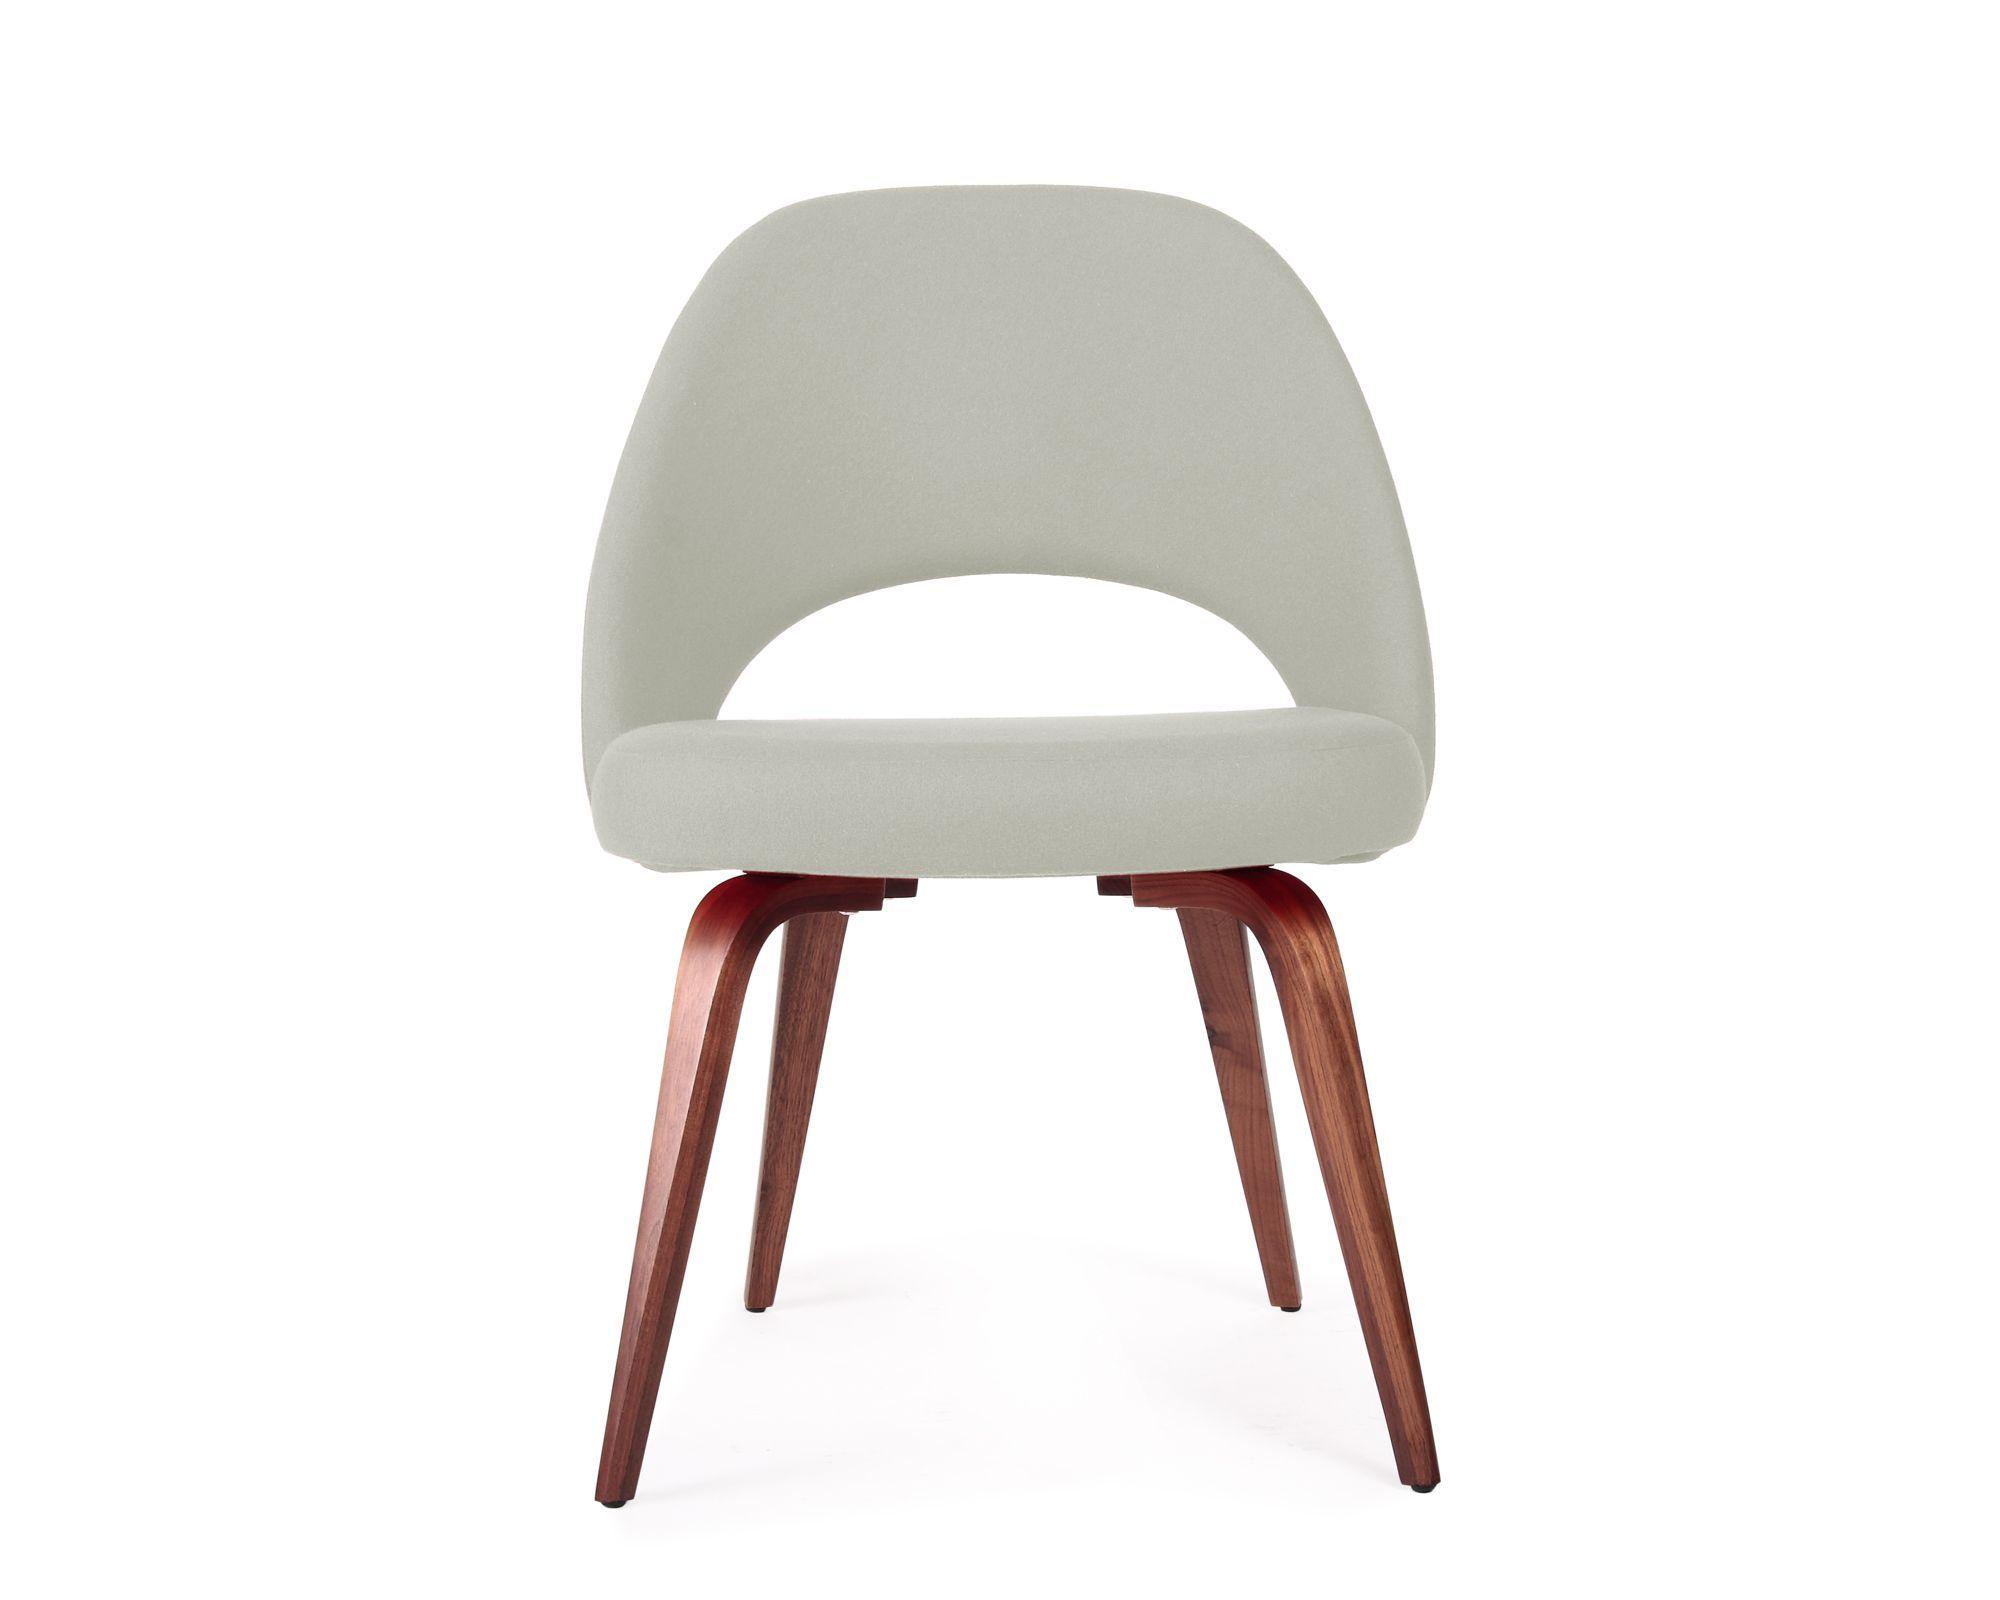 Saarinen Executive Side Chair_Wood_Cashmere Wool_Smoky Quartz